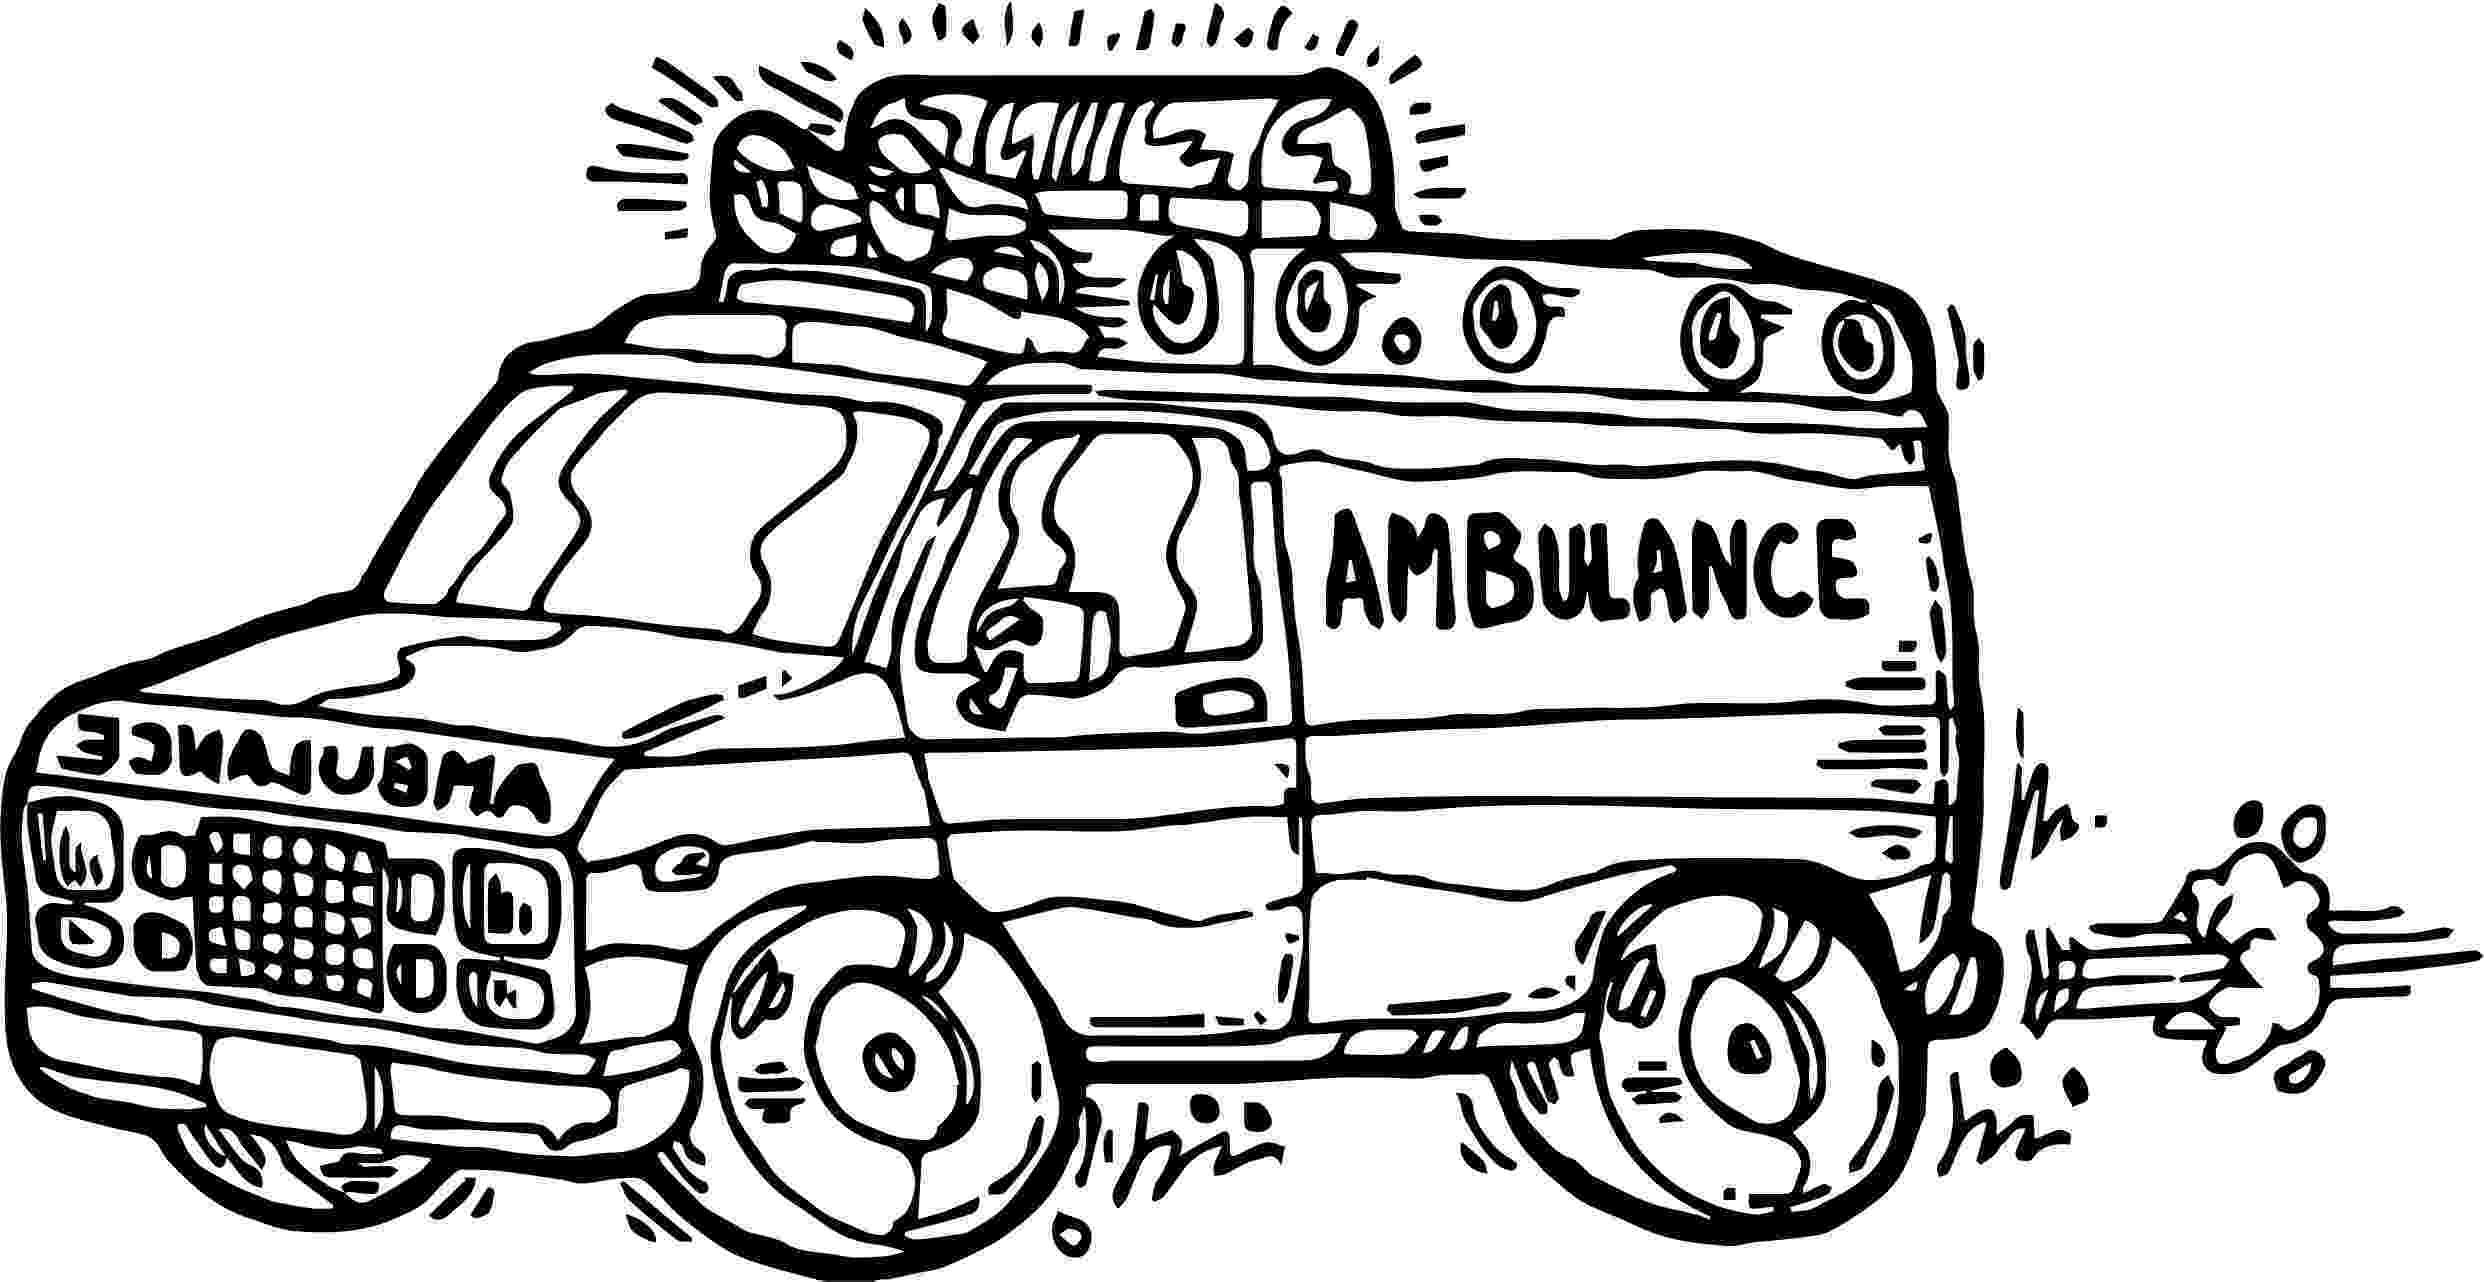 ambulance colouring pages 21 best ambulance coloring pages for kids updated 2018 pages colouring ambulance